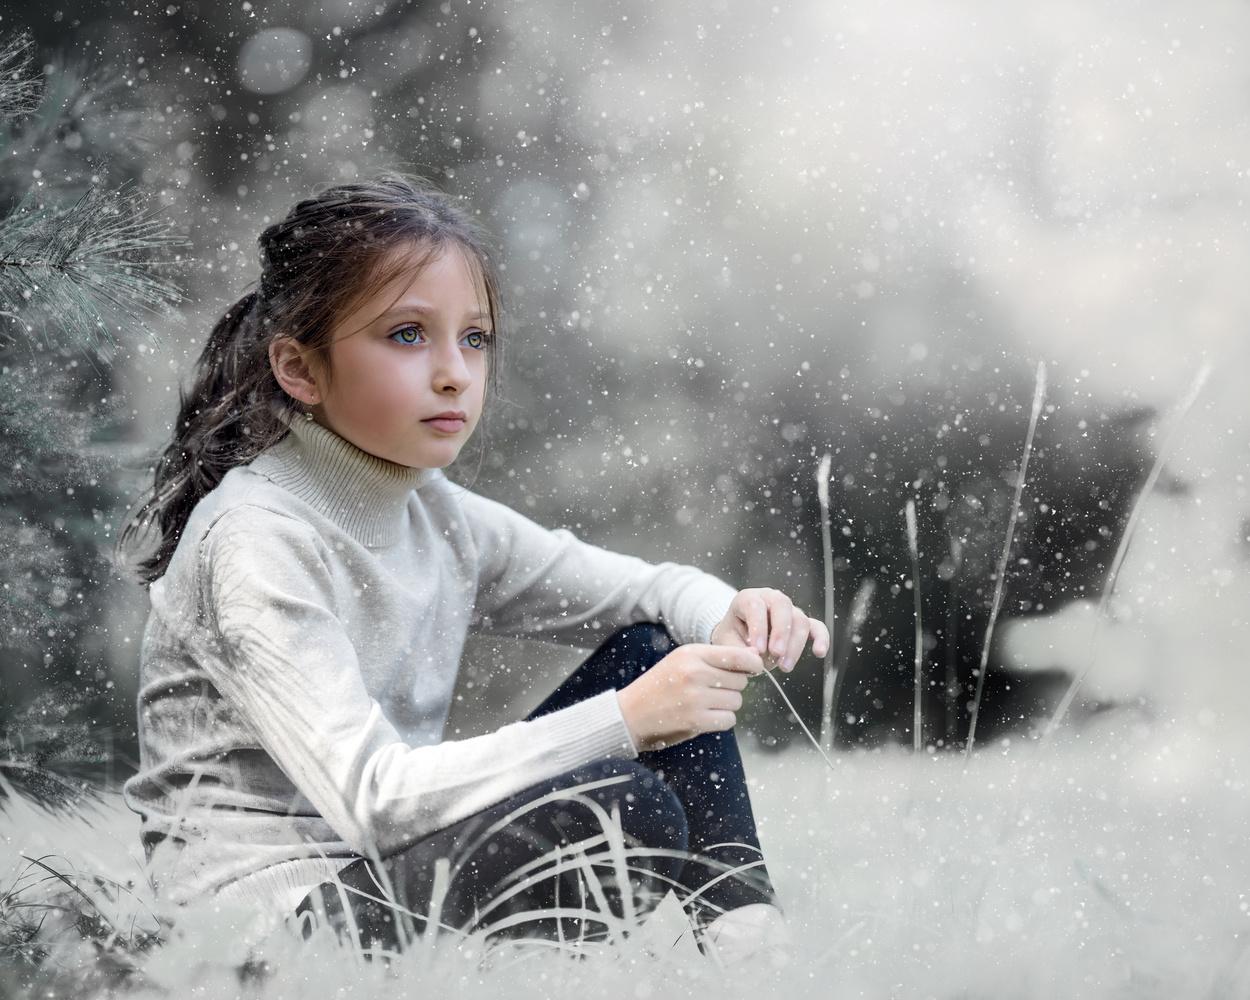 Winter by Skyler Ewing